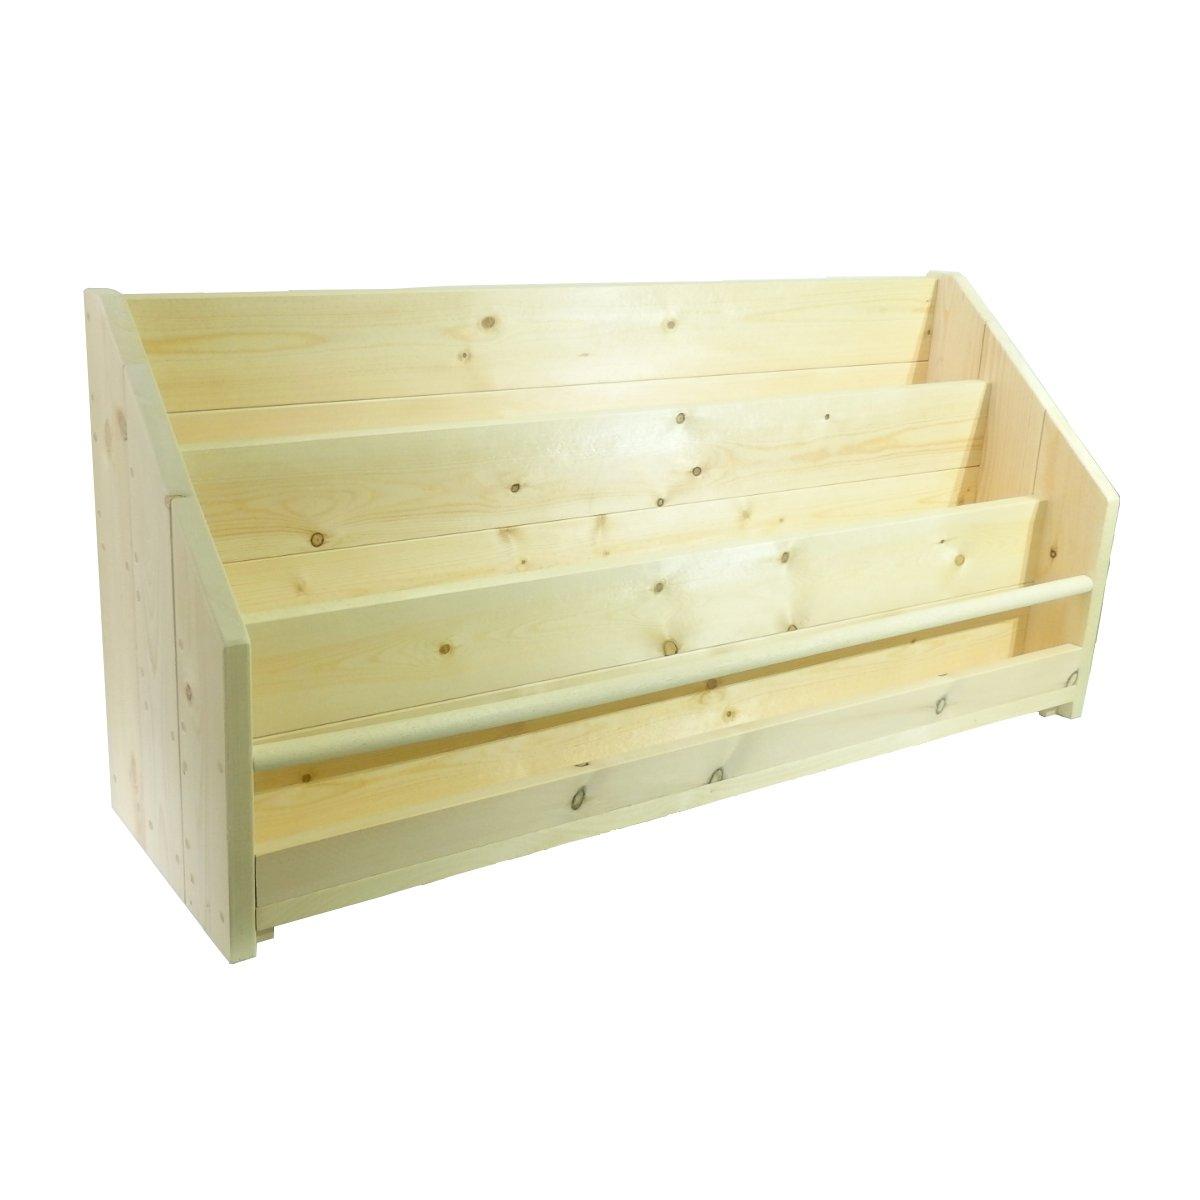 Make Woood シンプルな絵本ラック キッズ ブックシェルフ ディスプレイ【完成品】ハンドメイド 木の香りと温かみのある雰囲気 ナチュラル 素材 子ども目線で取り出しやすい ロータイプA たくさん置ける 60cm (ICO-BKSF/W60AL) B071DD4XR2 W60cm AL  W60cm AL